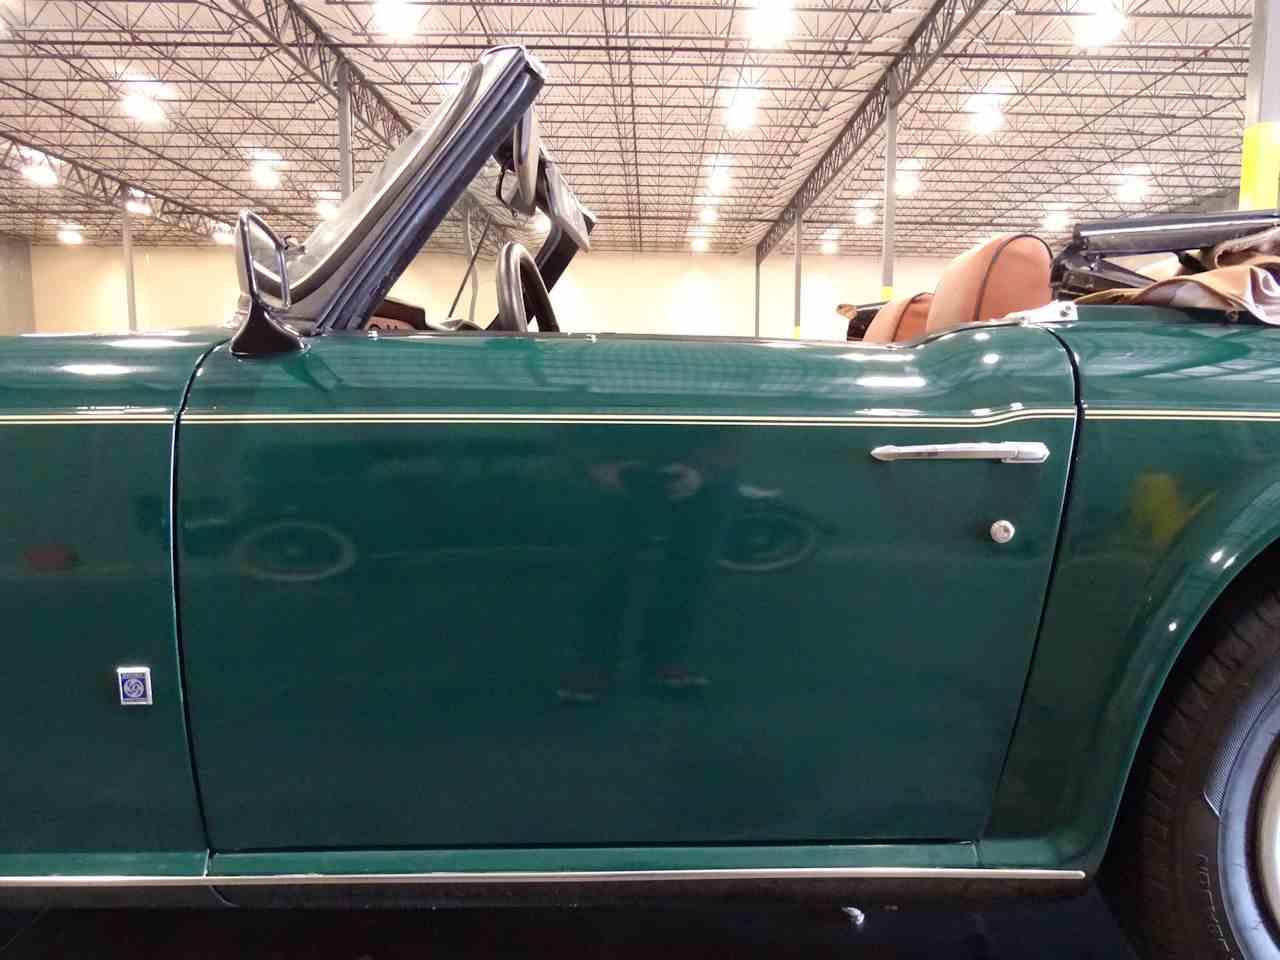 1972 Triumph TR6 for Sale | ClassicCars.com | CC-1055741